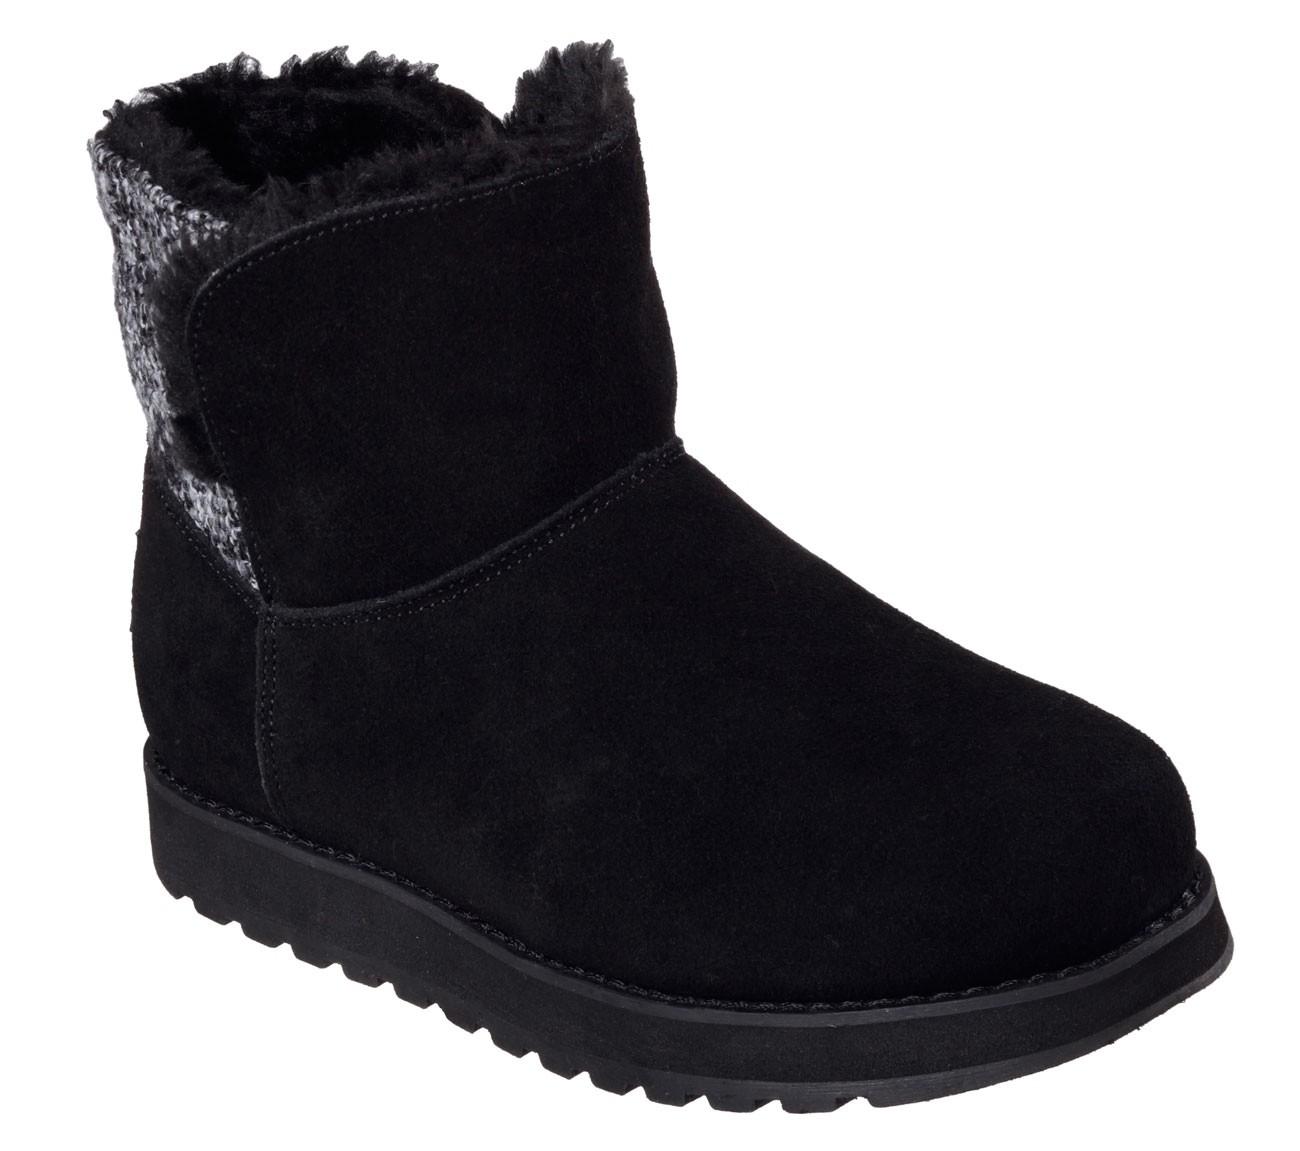 Dámská zimní obuv Skechers KEEPSAKES - PEEKABOO  e828063505